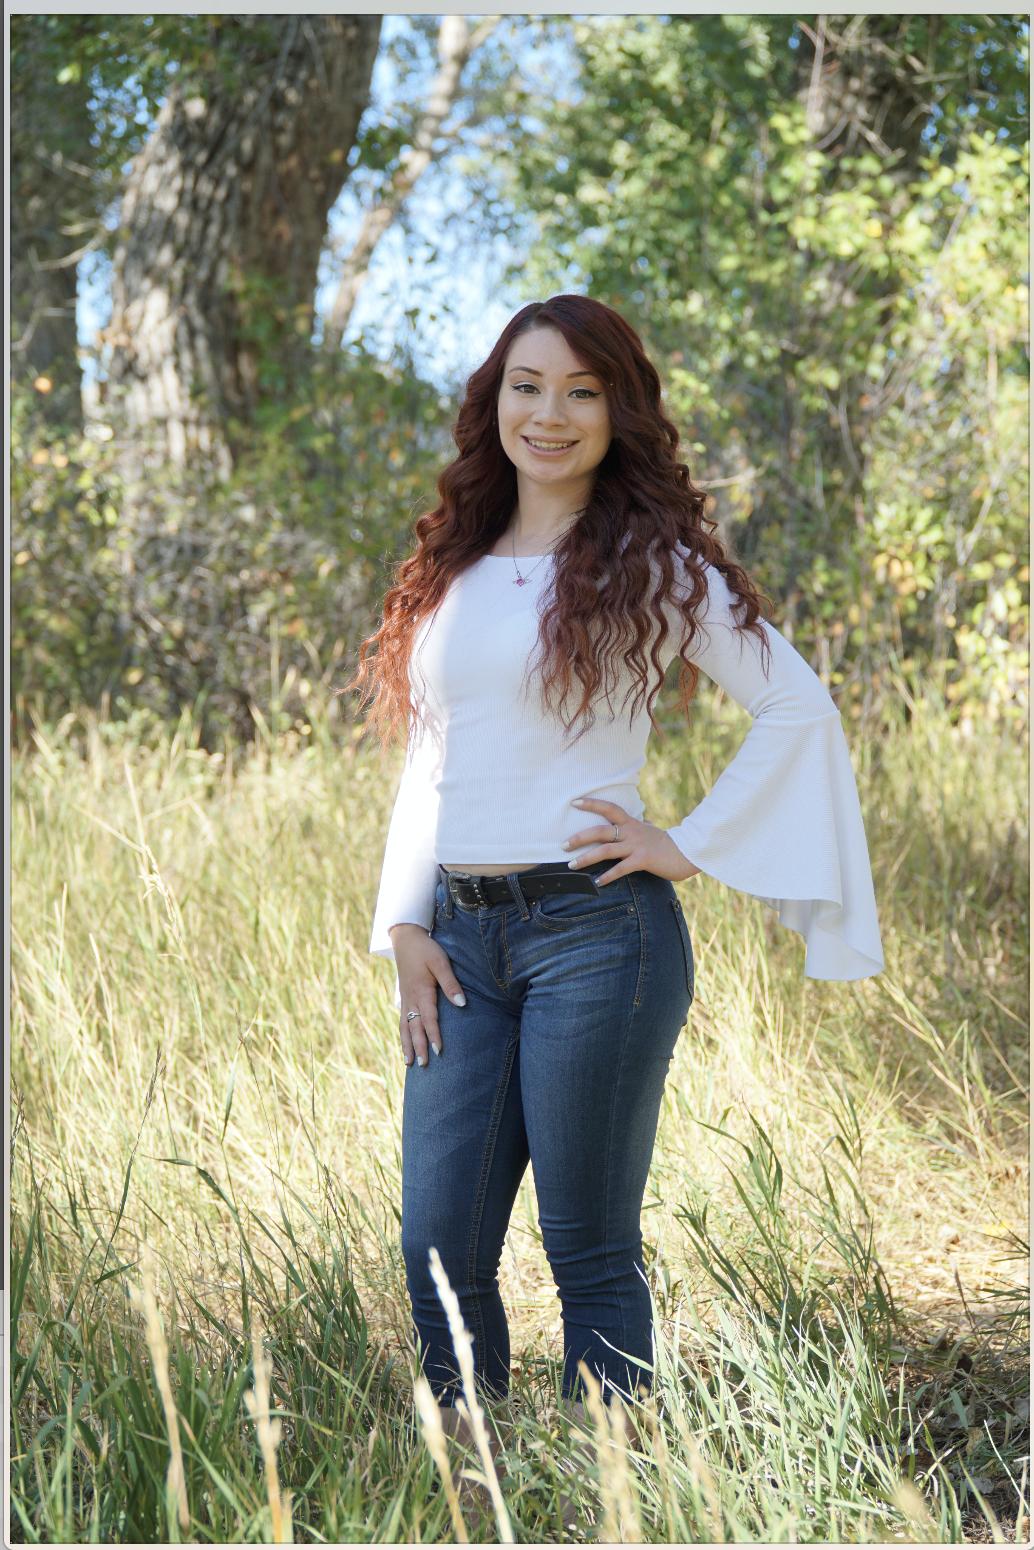 Alyssa Cordova Arapahoe Community College